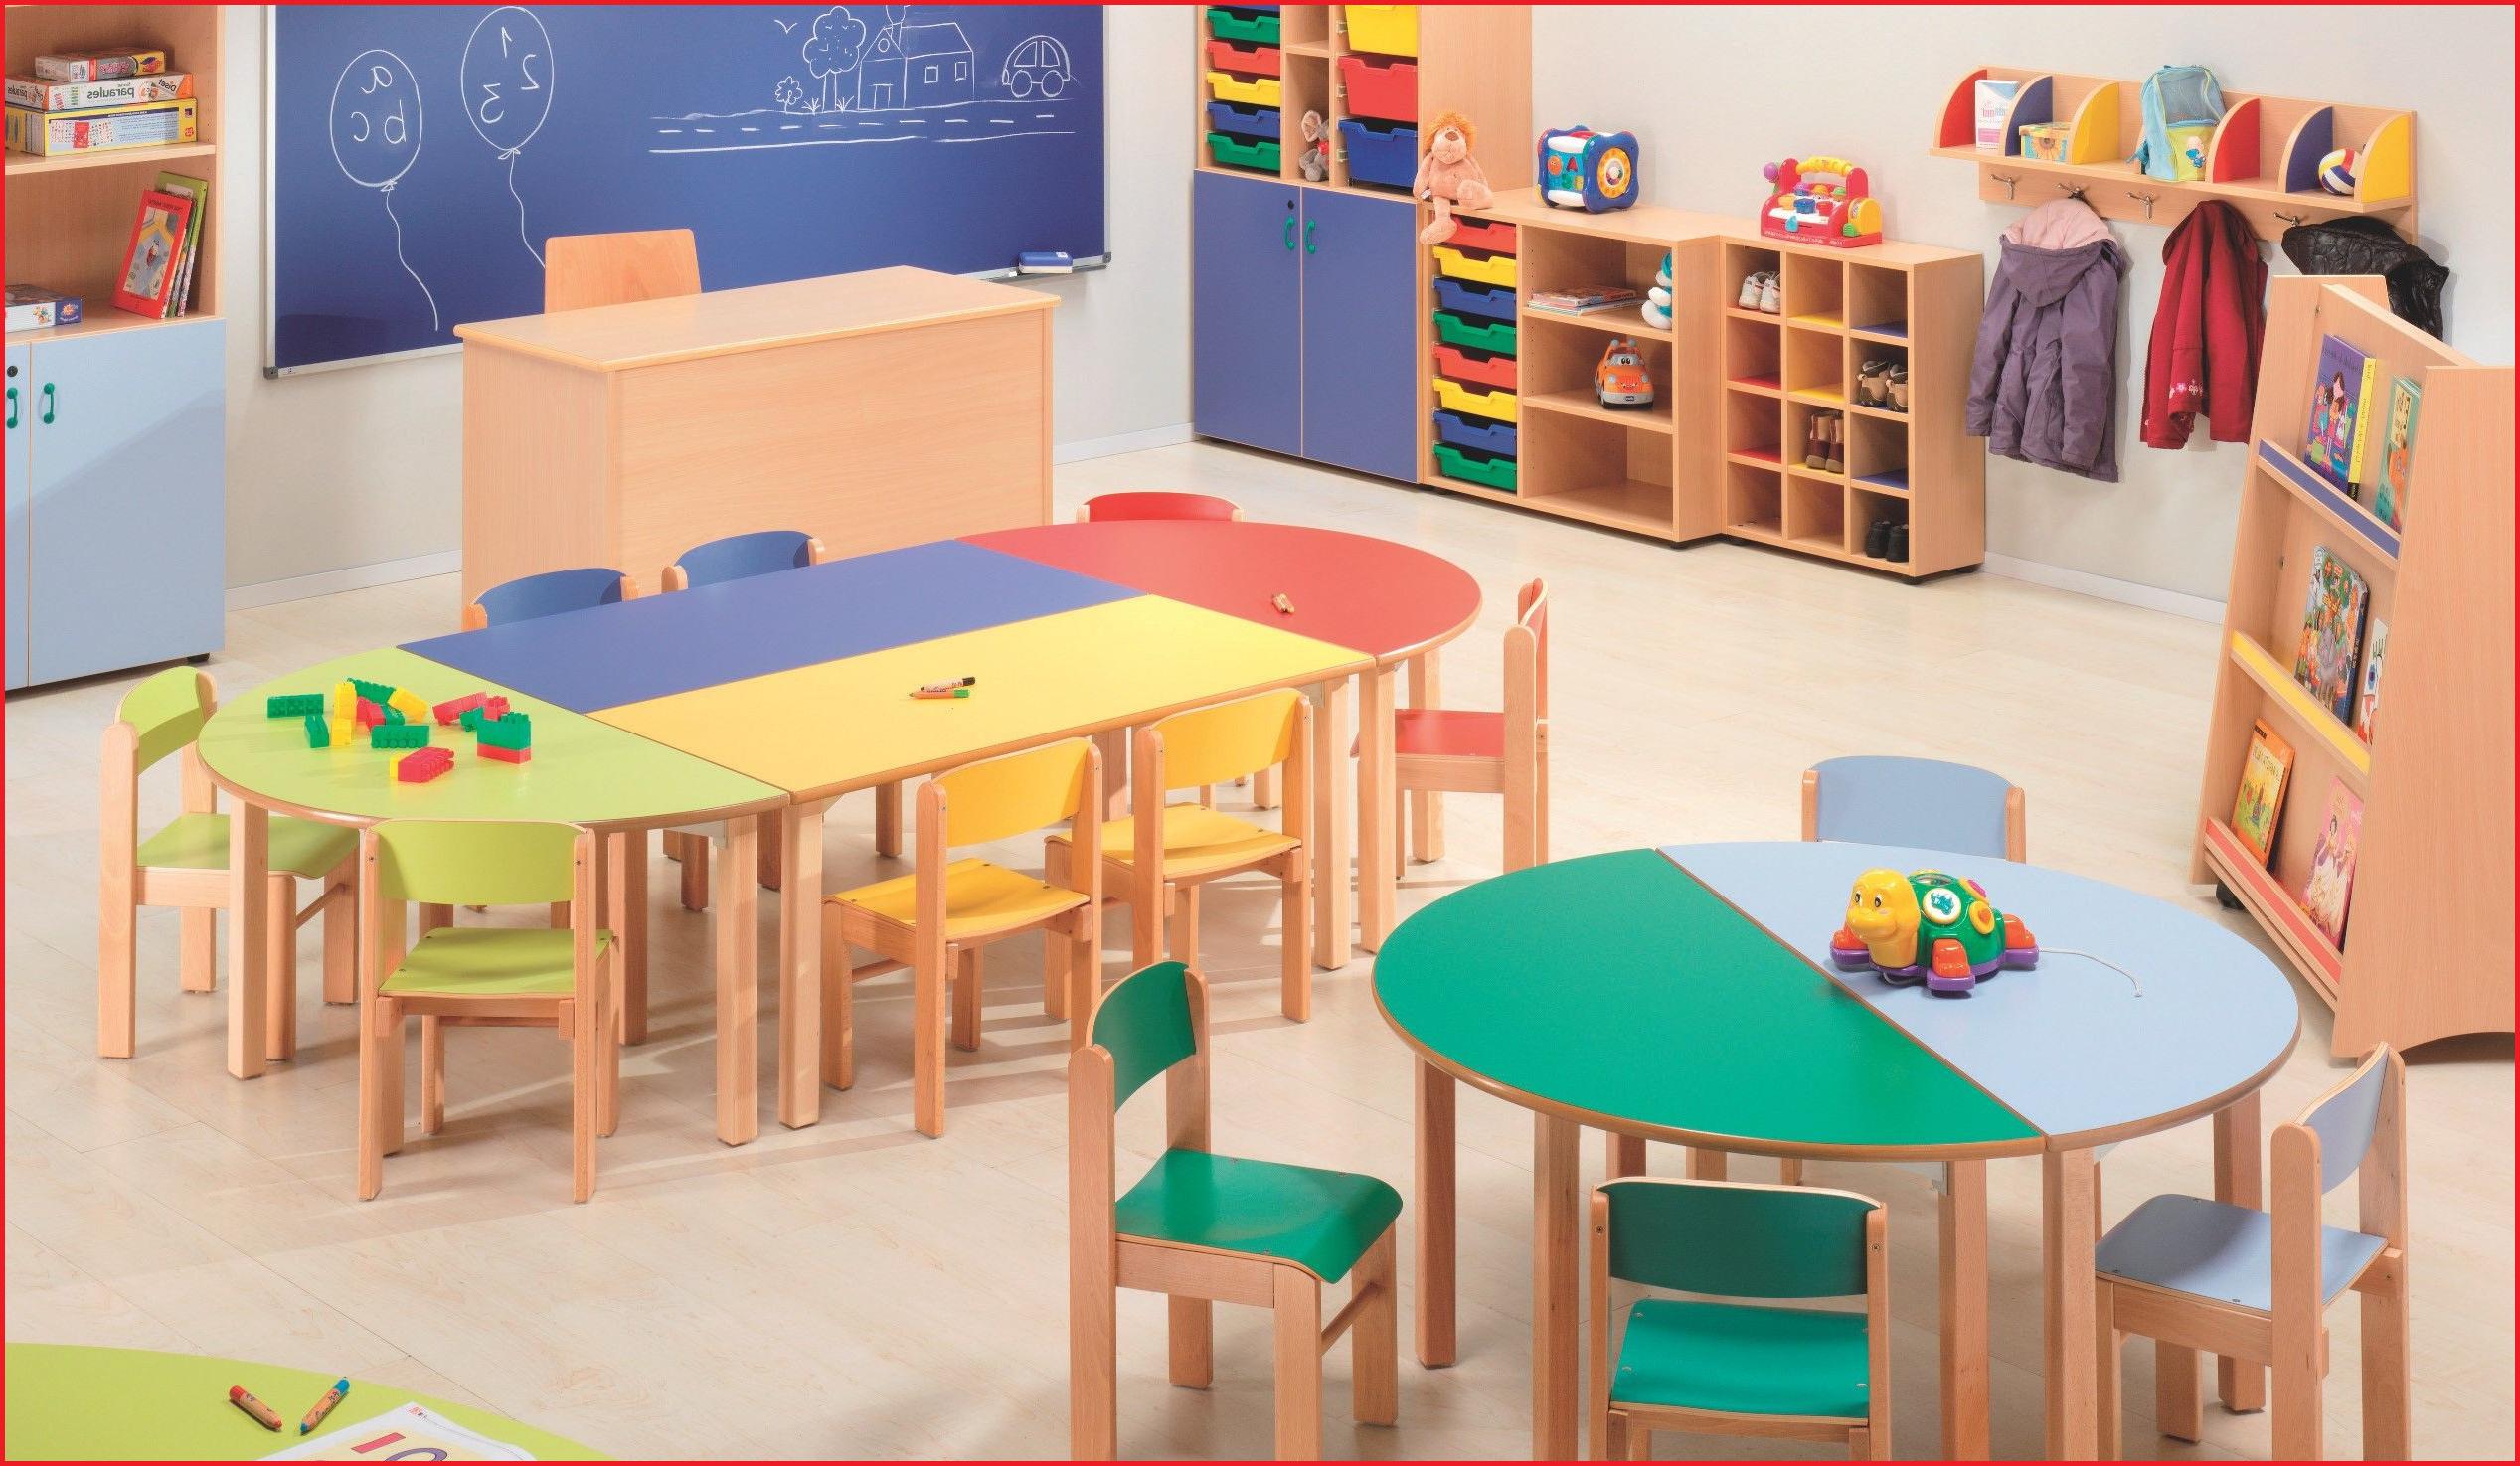 Mobiliario Escolar Infantil U3dh Muebles Para Guarderias Silla Escuela Infantil Mobiliario